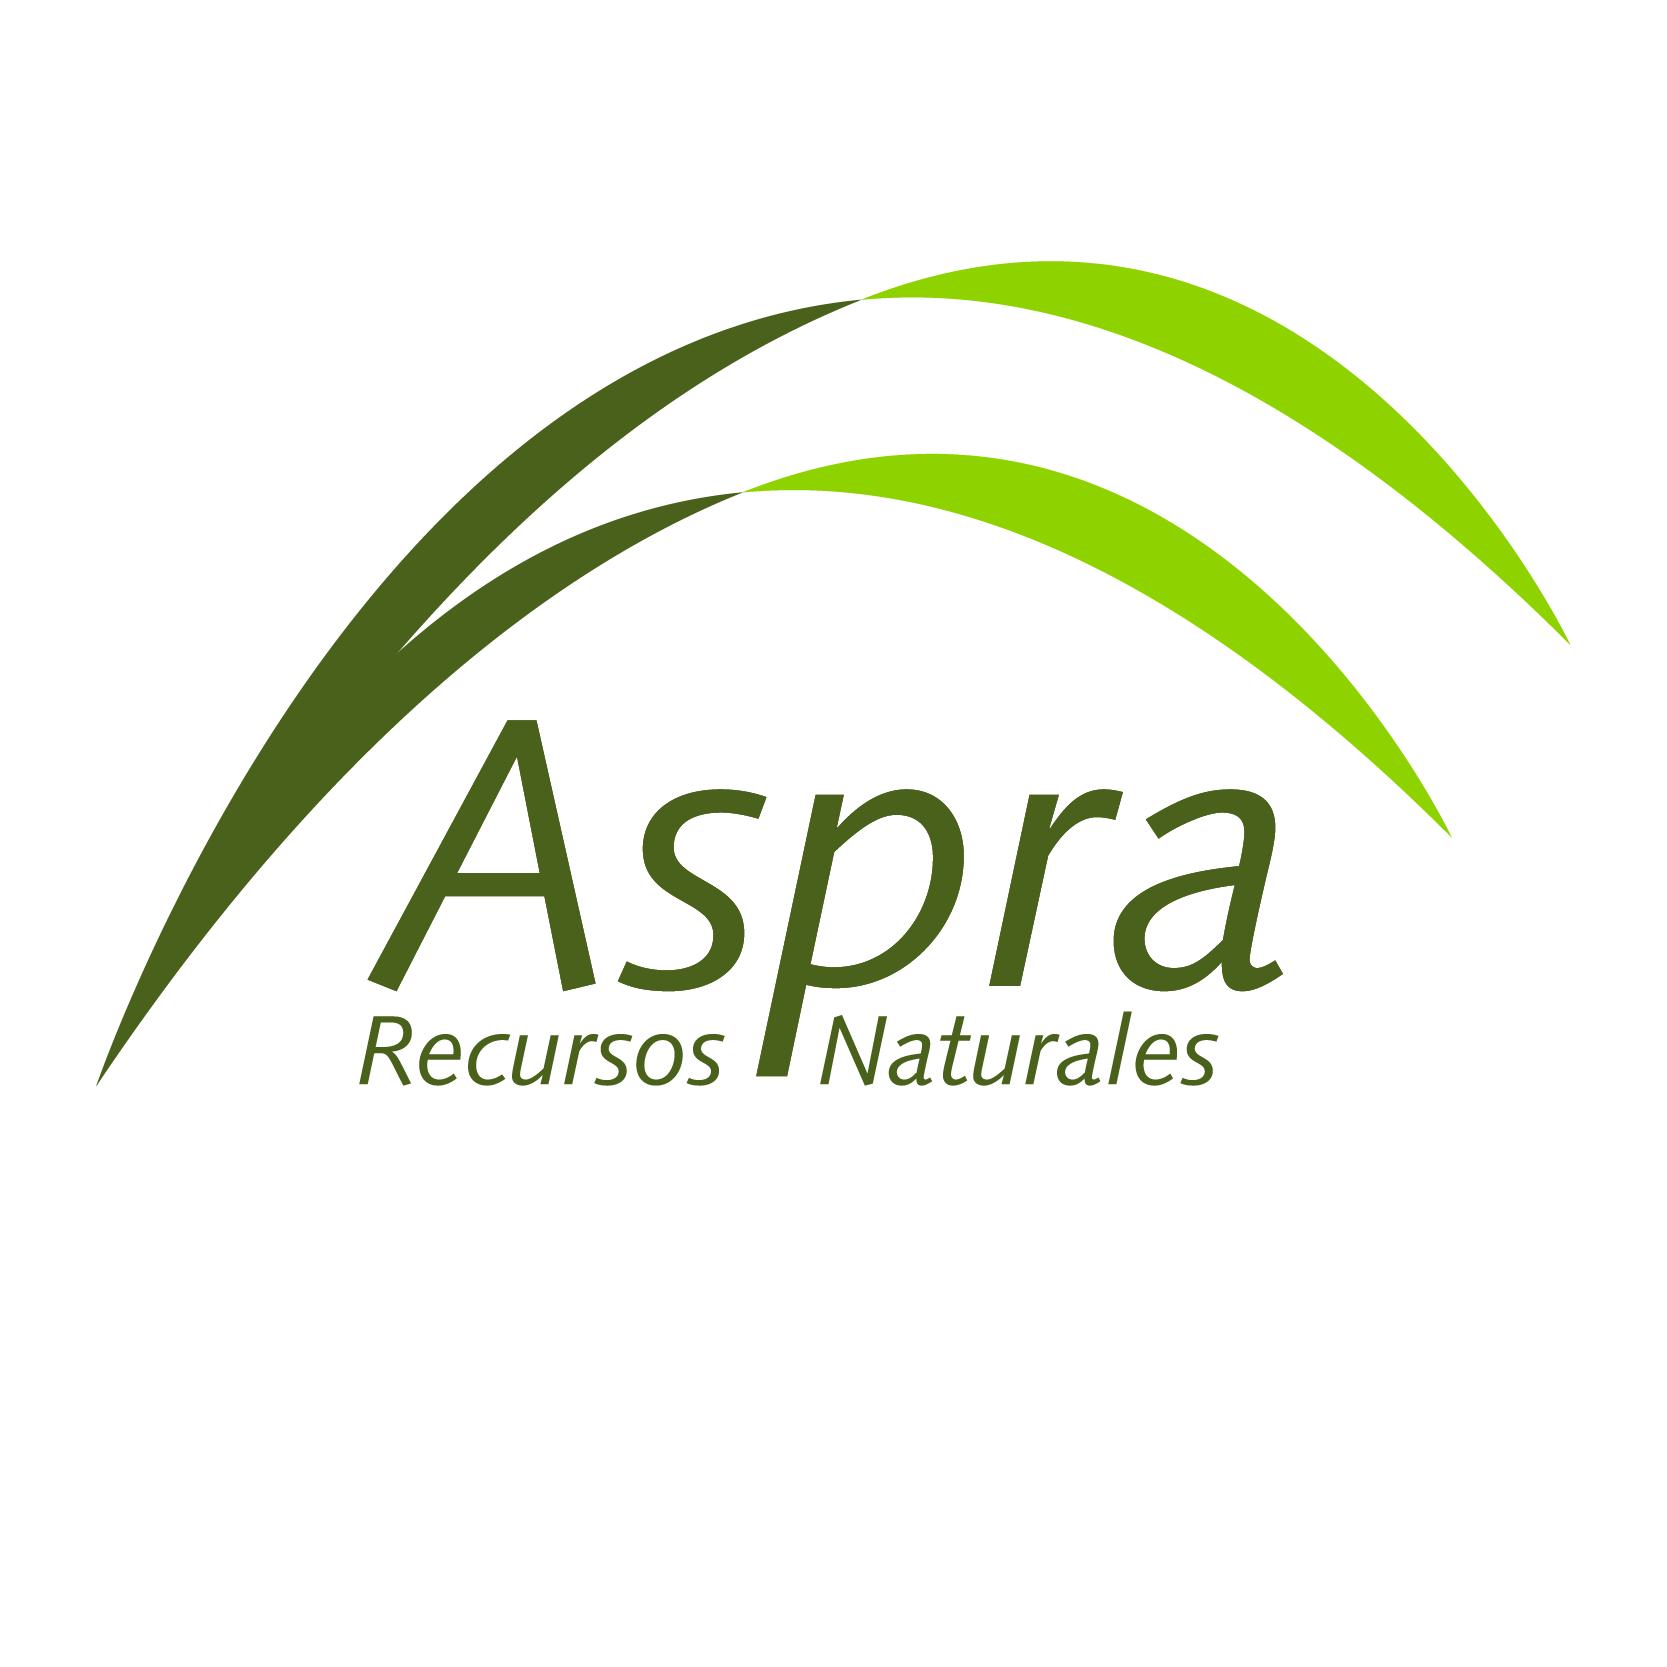 ASPRA Recursos Naturales